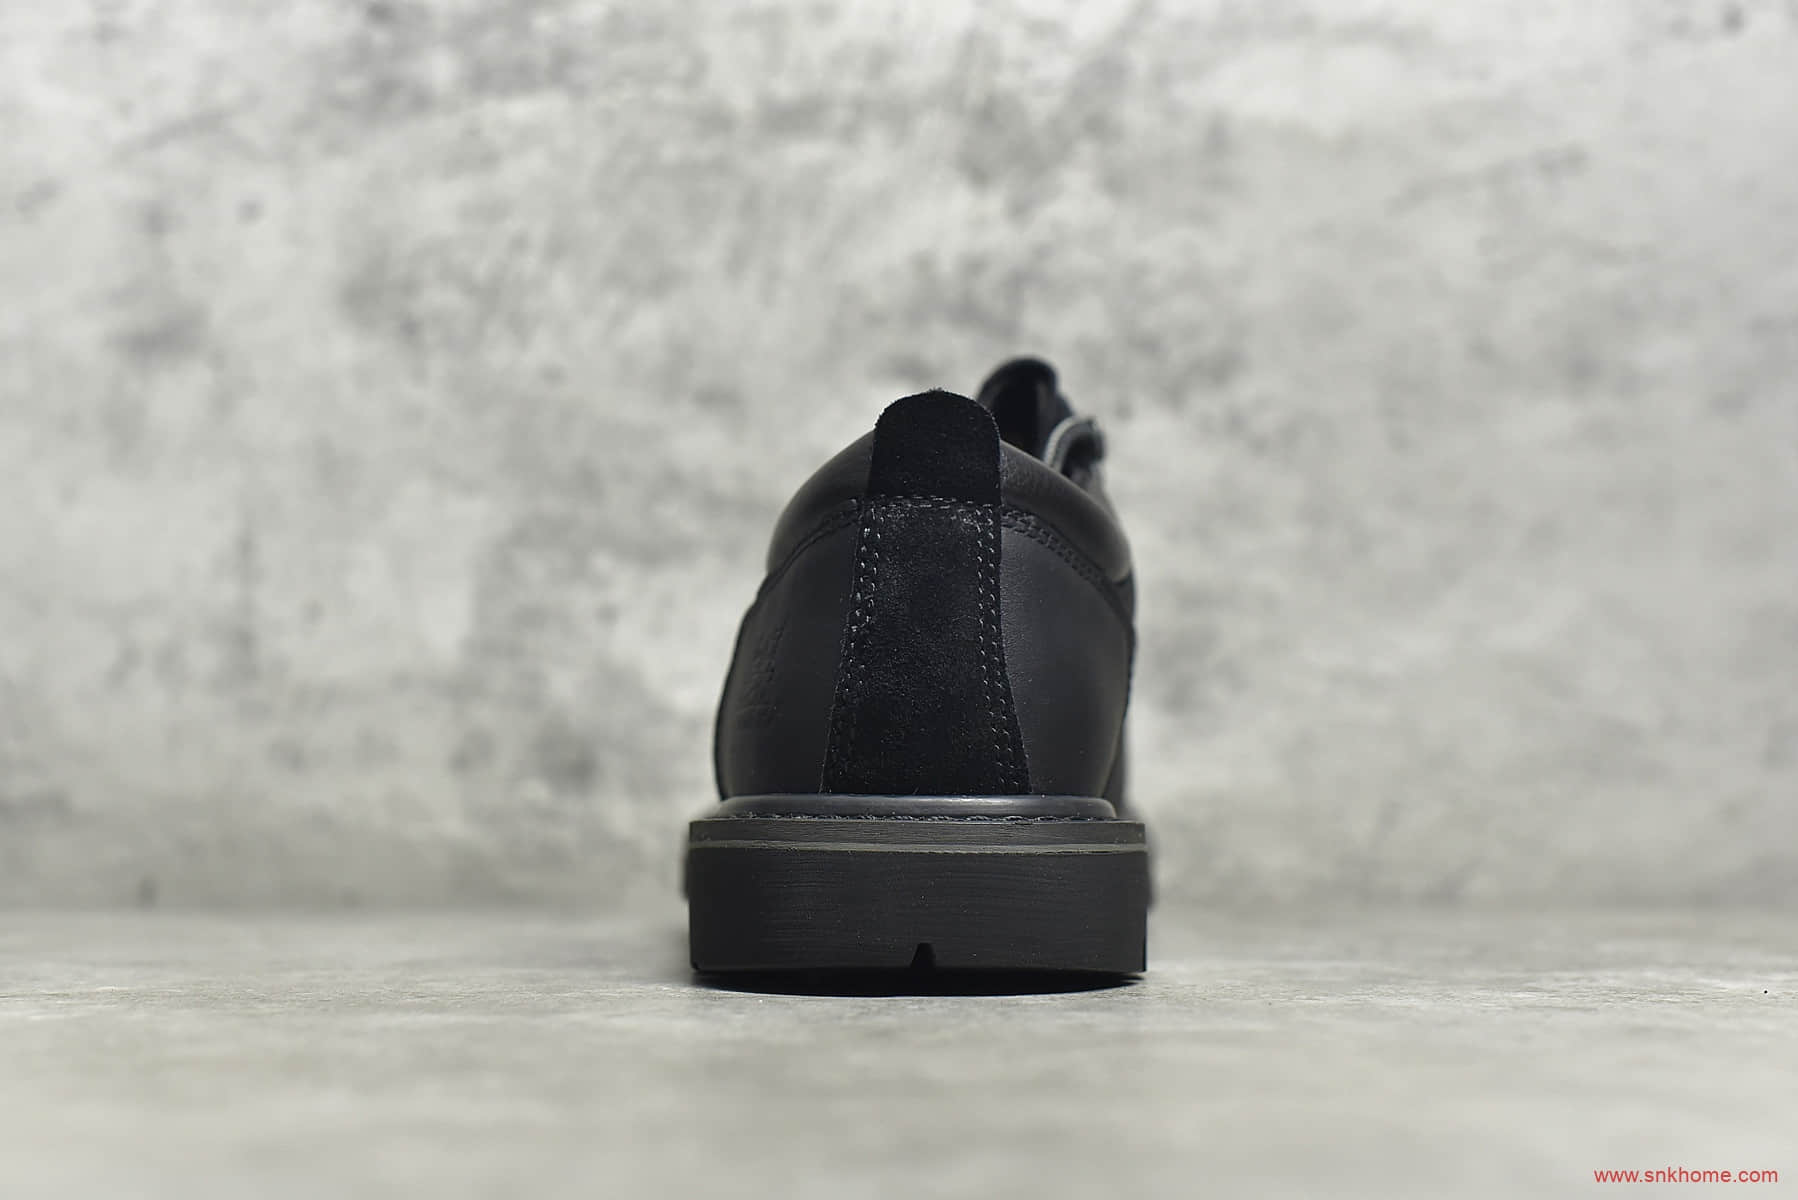 CAT卡特P717802男款马丁靴 卡特黑色低帮马丁靴正品复刻莆田代工厂-潮流者之家